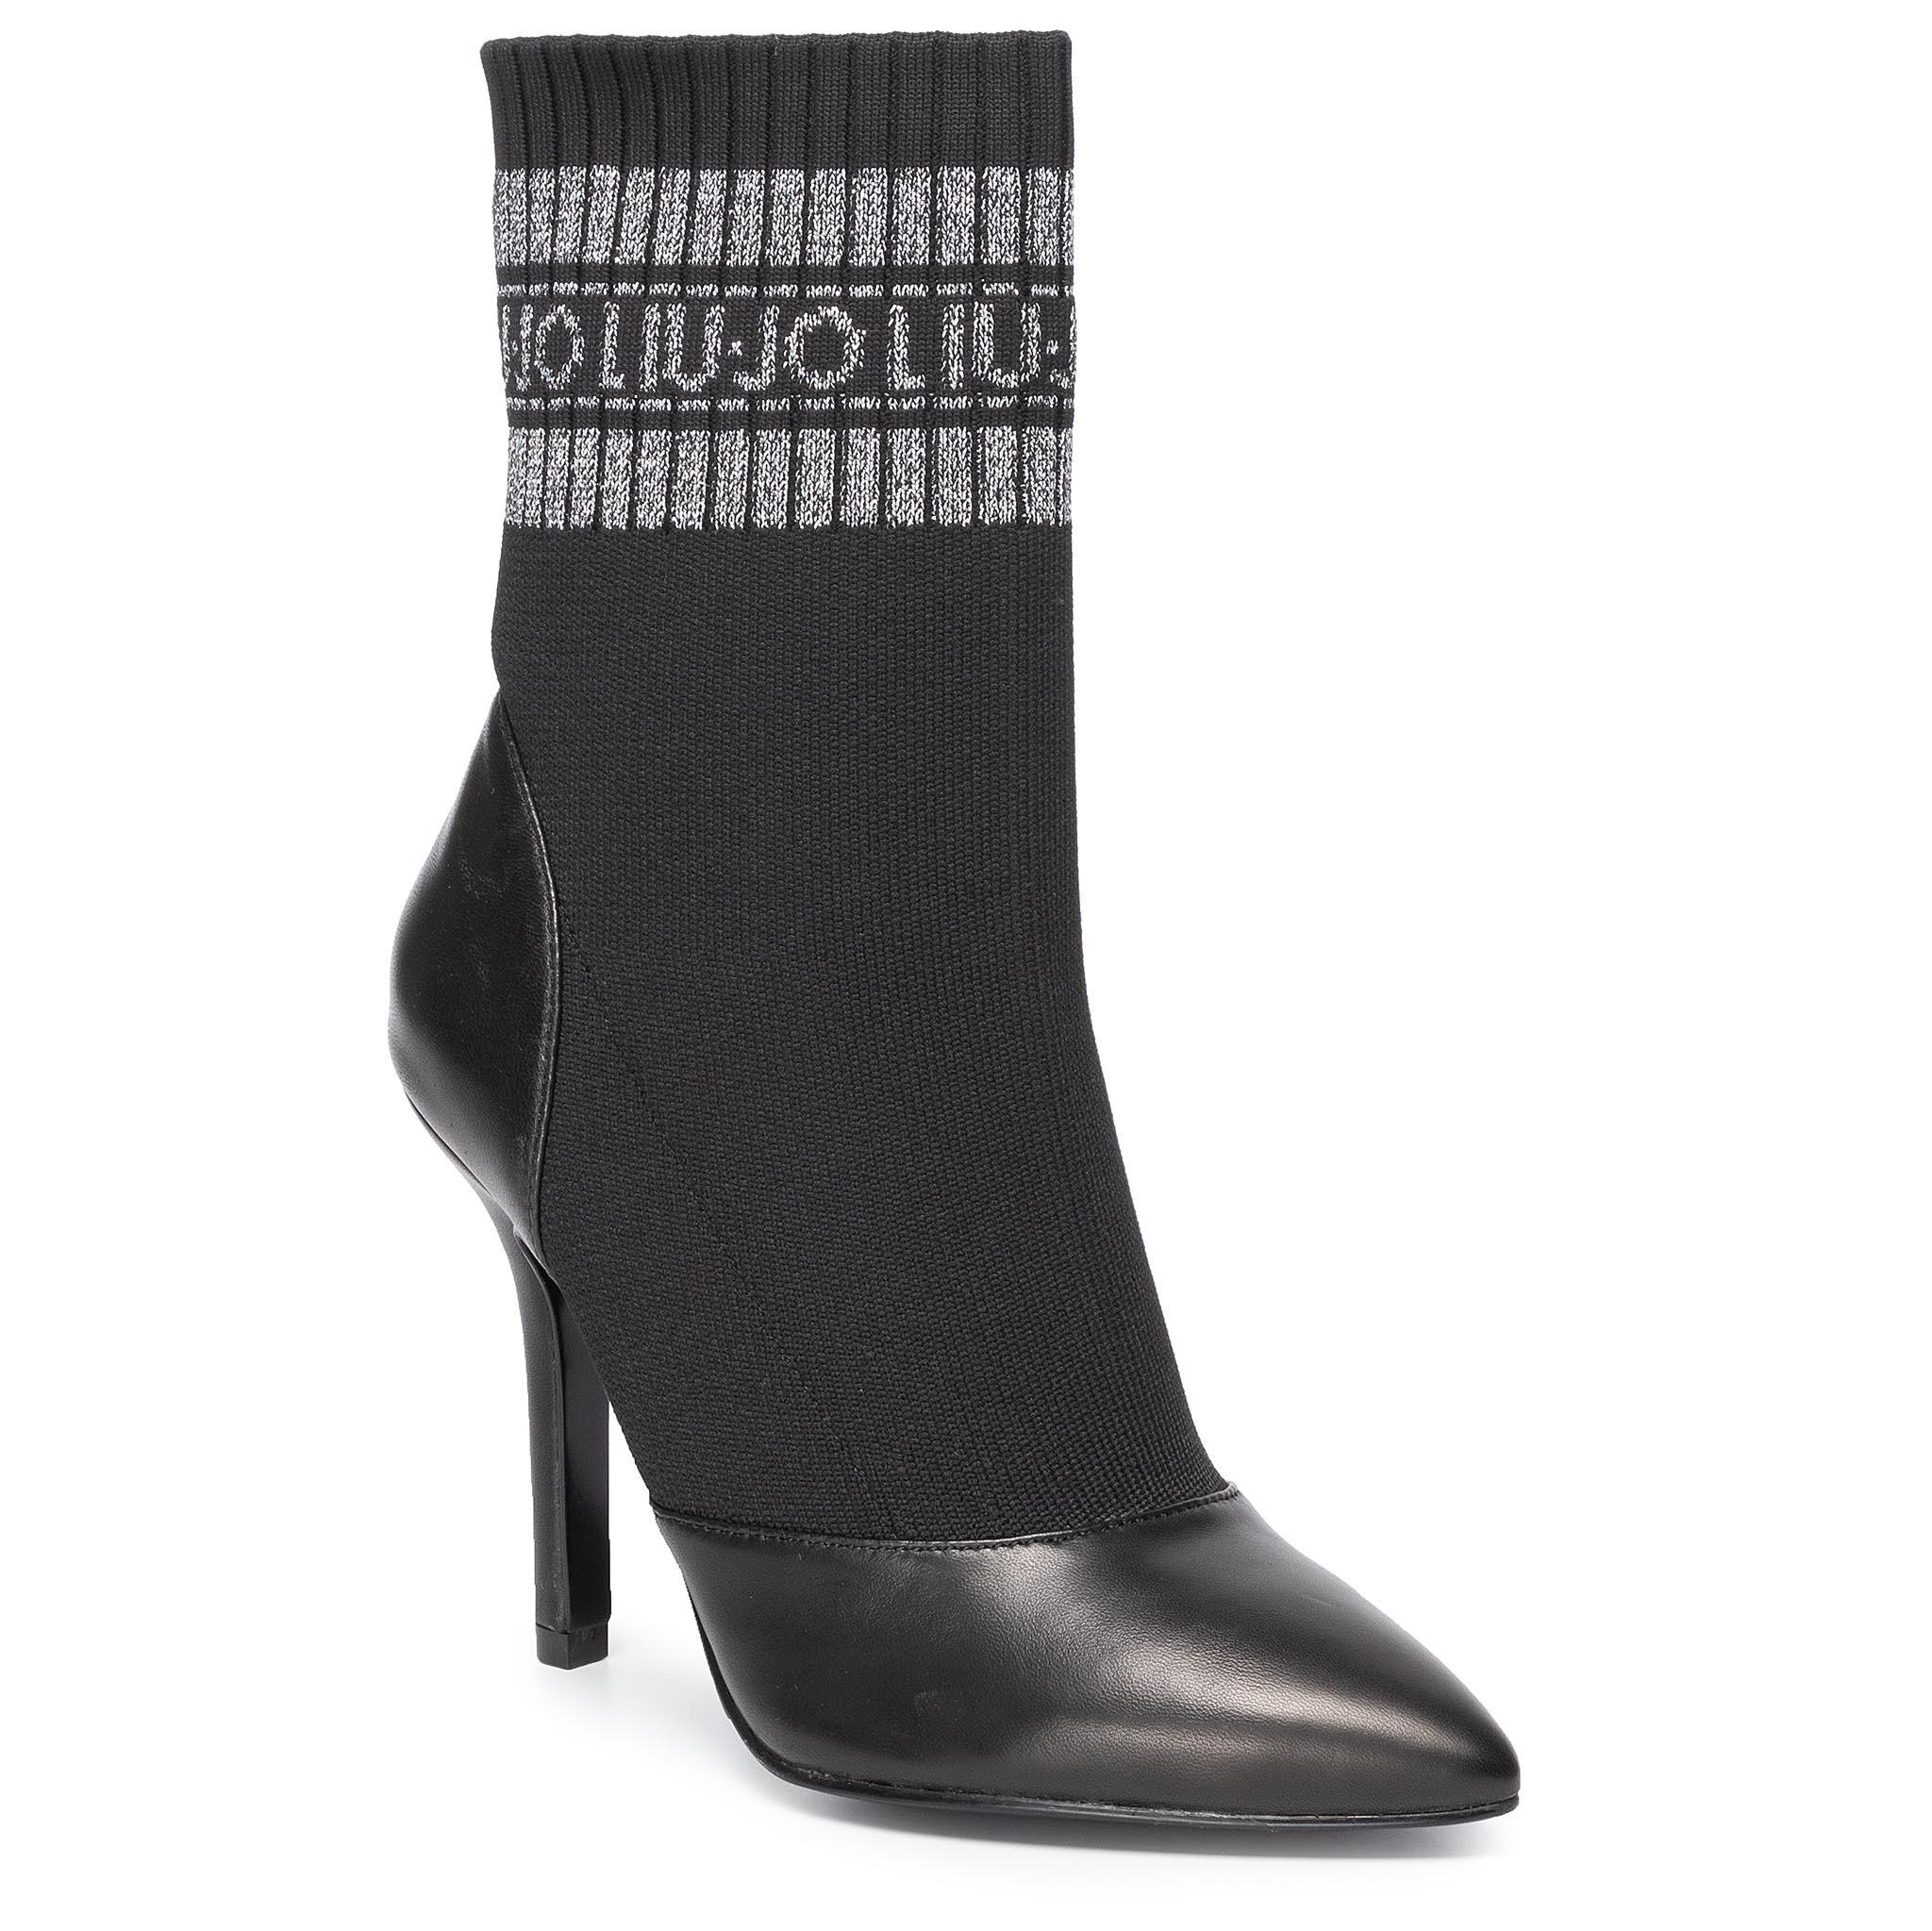 Botine LIU JO - Bea 4 Sock Bootie S69031 TX022 Black 22222